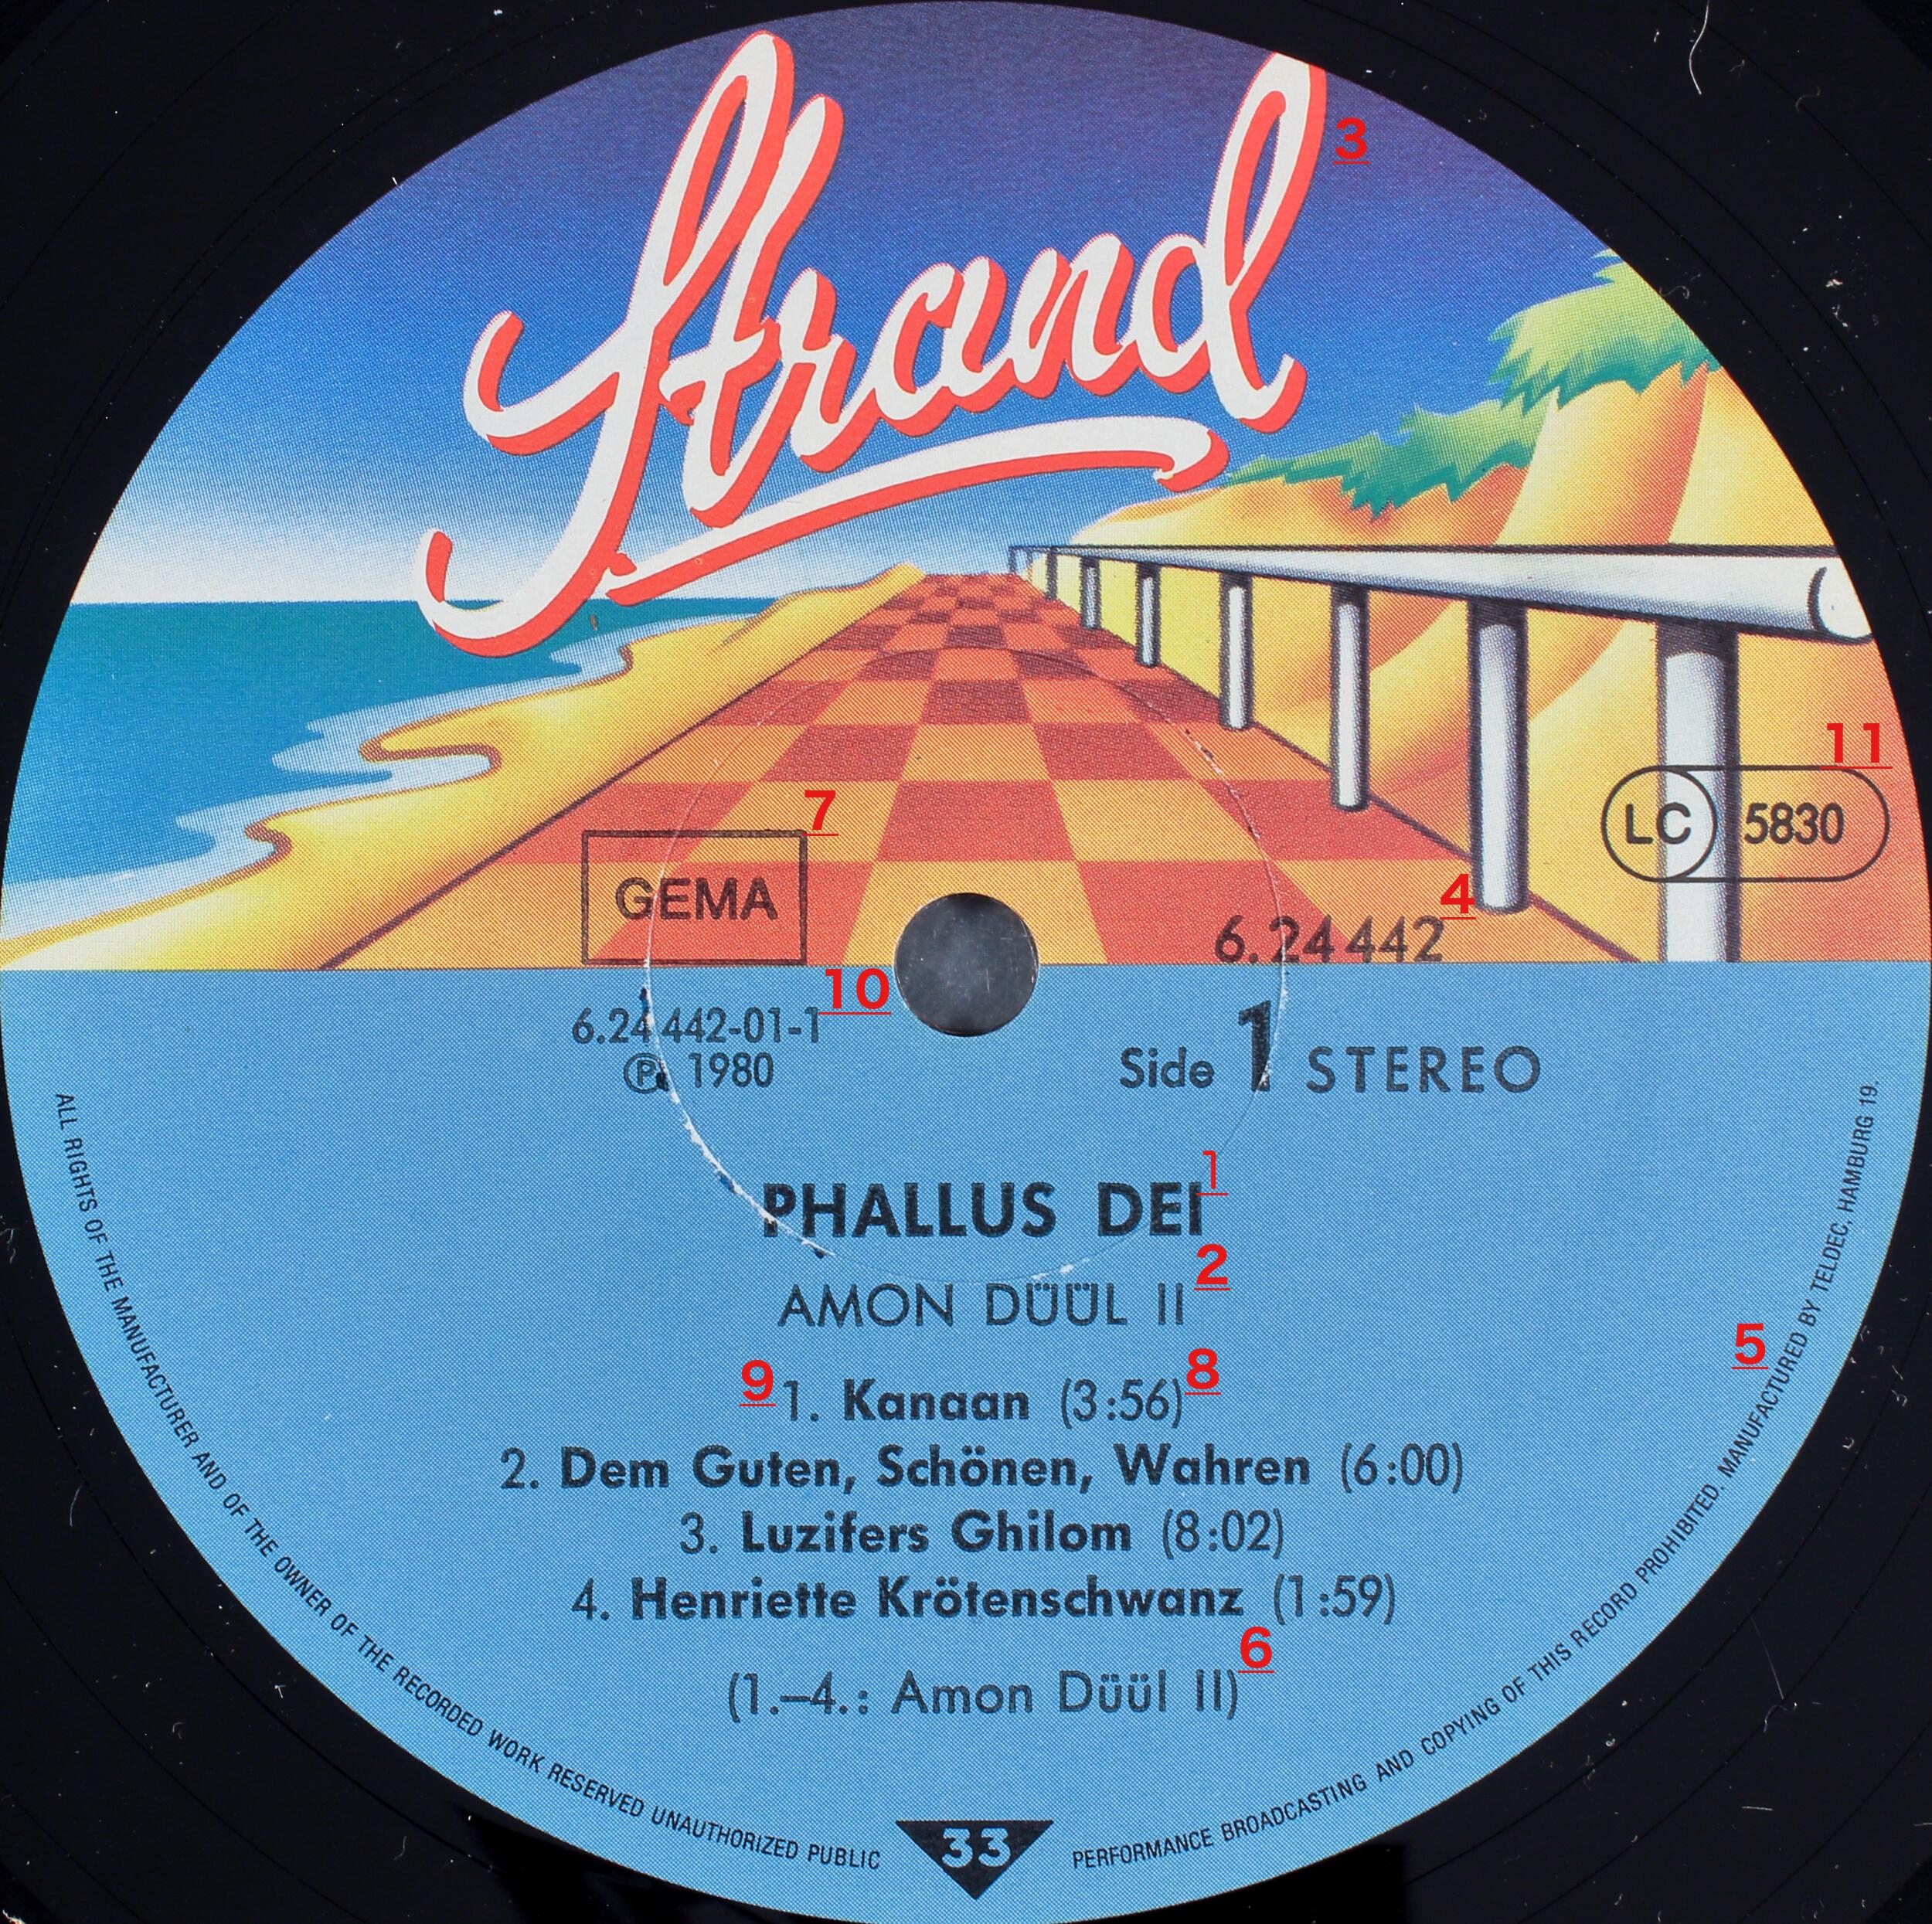 dating records vinyl